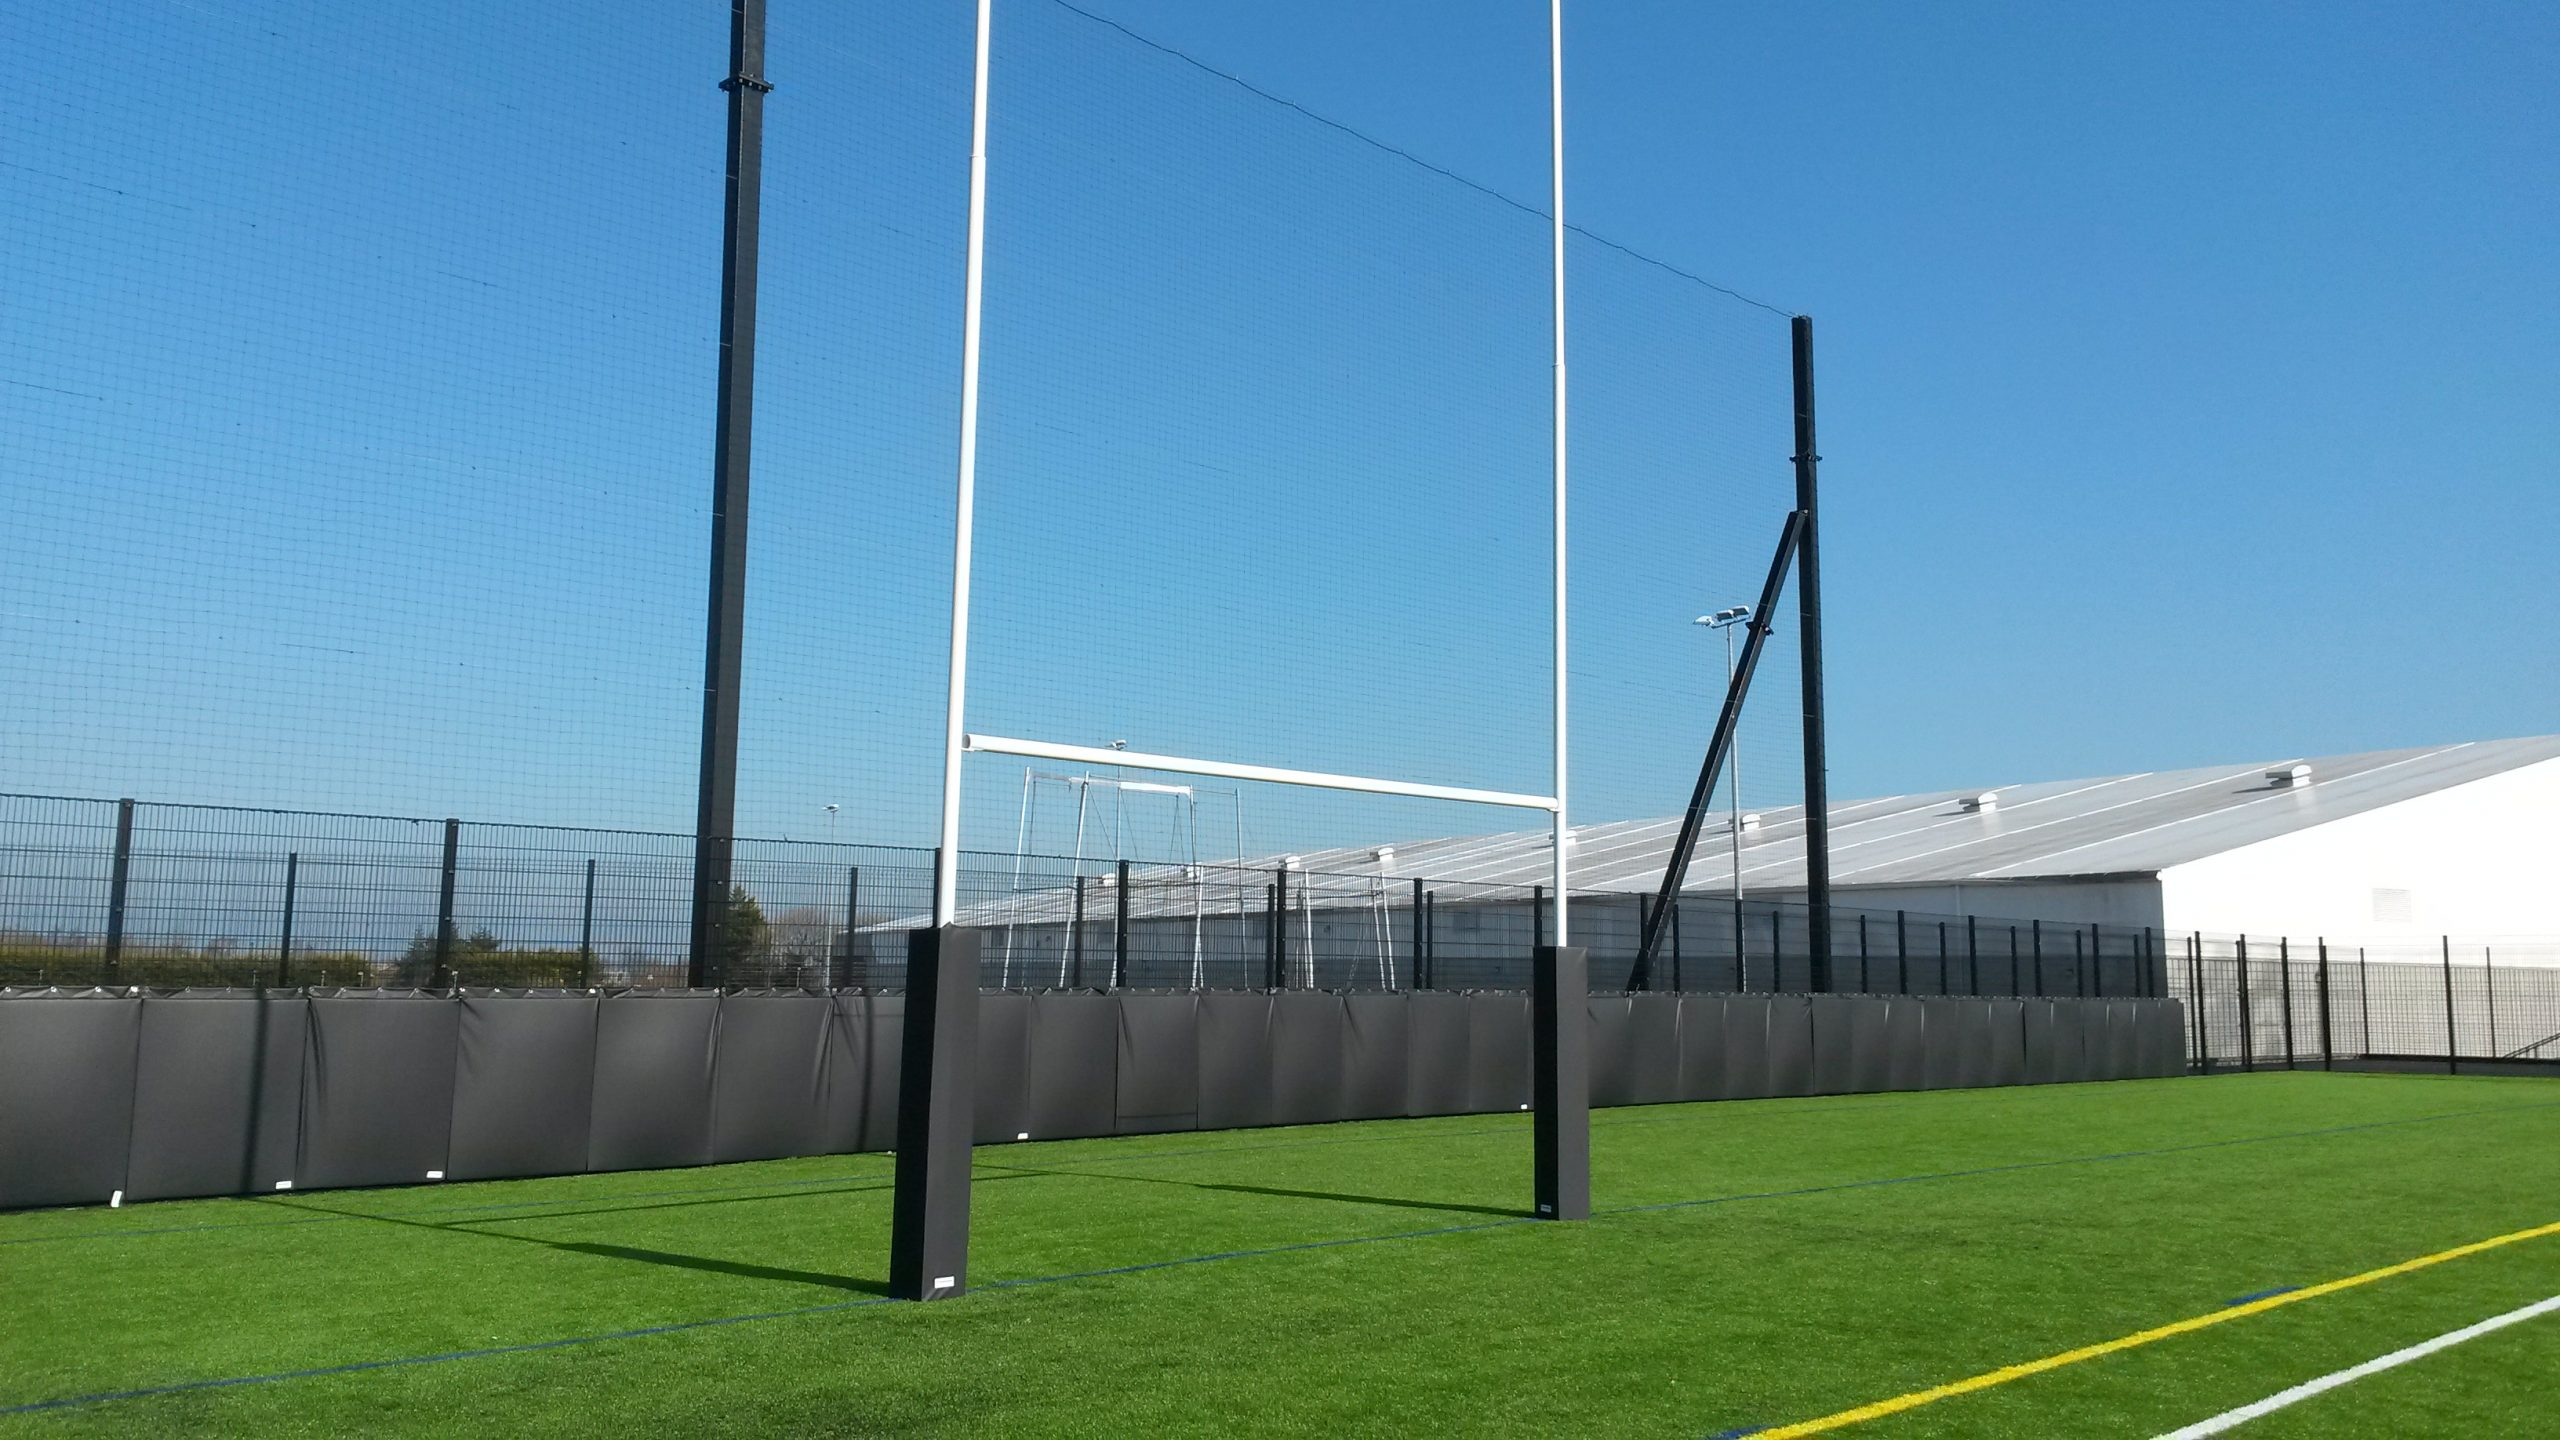 Juvenile Rugby Goals